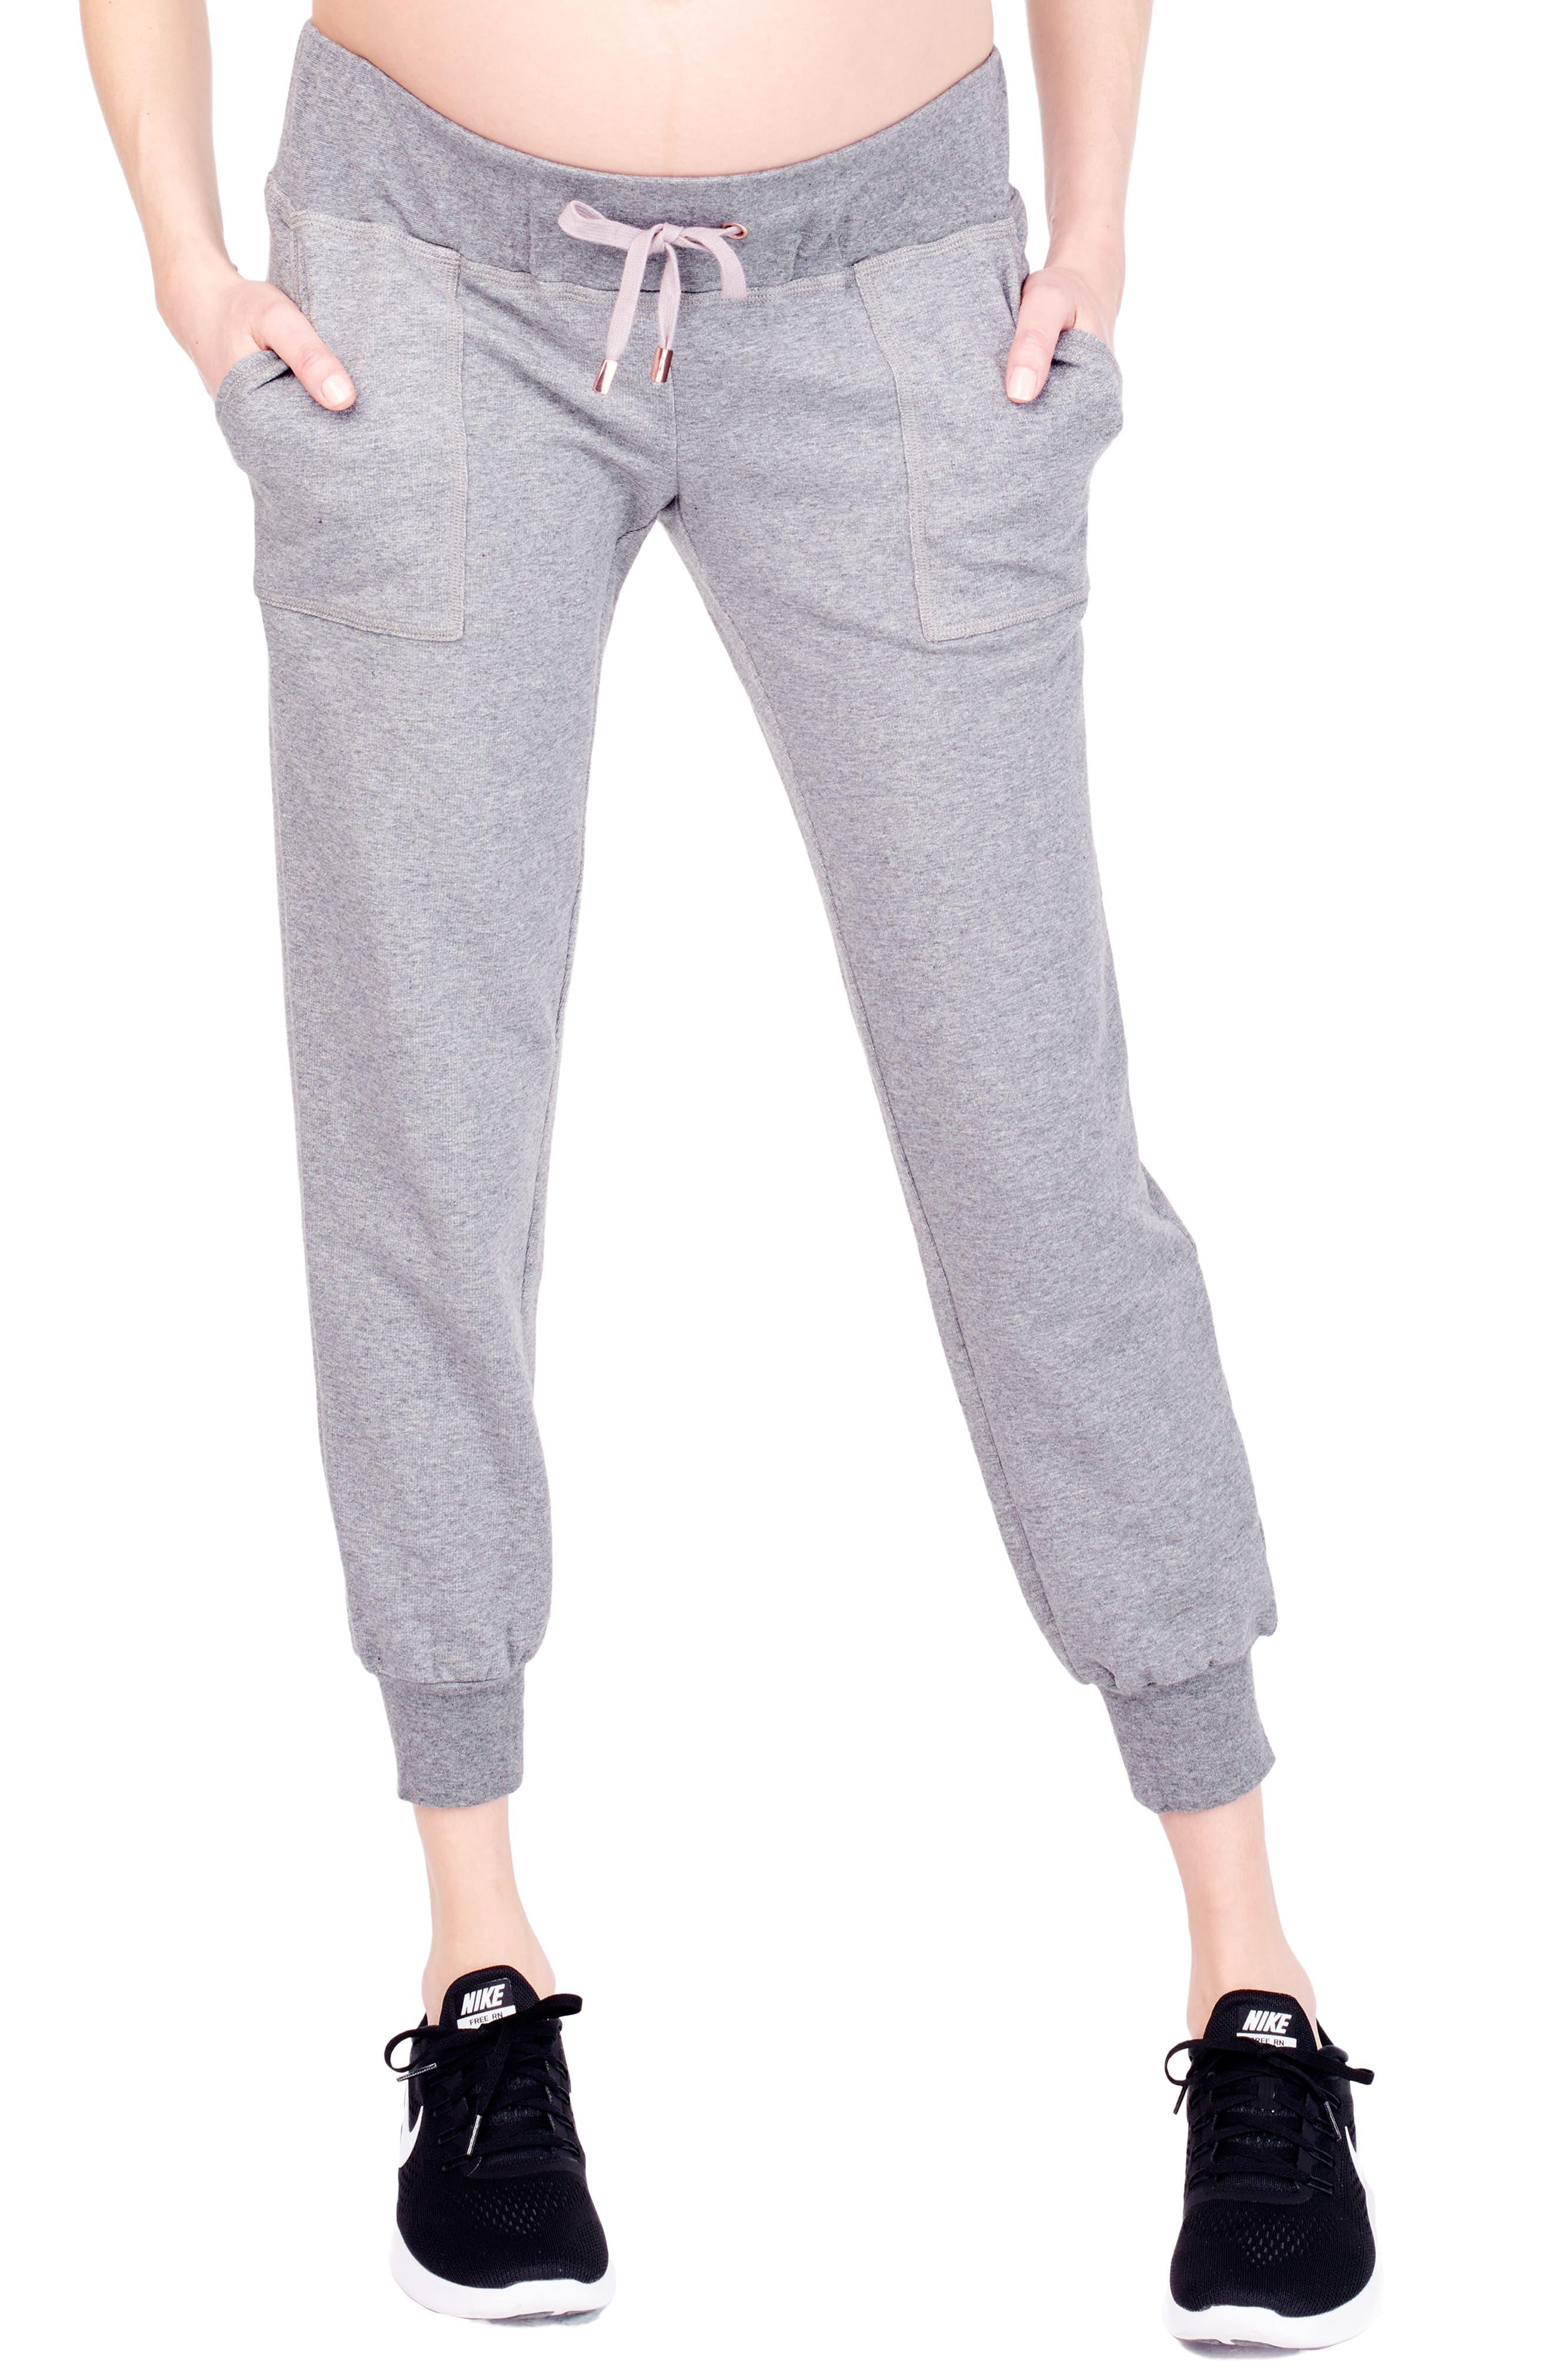 Alternate Image 1 Selected - Ingrid & Isabel® Cozy Fleece Maternity Jogger Pants